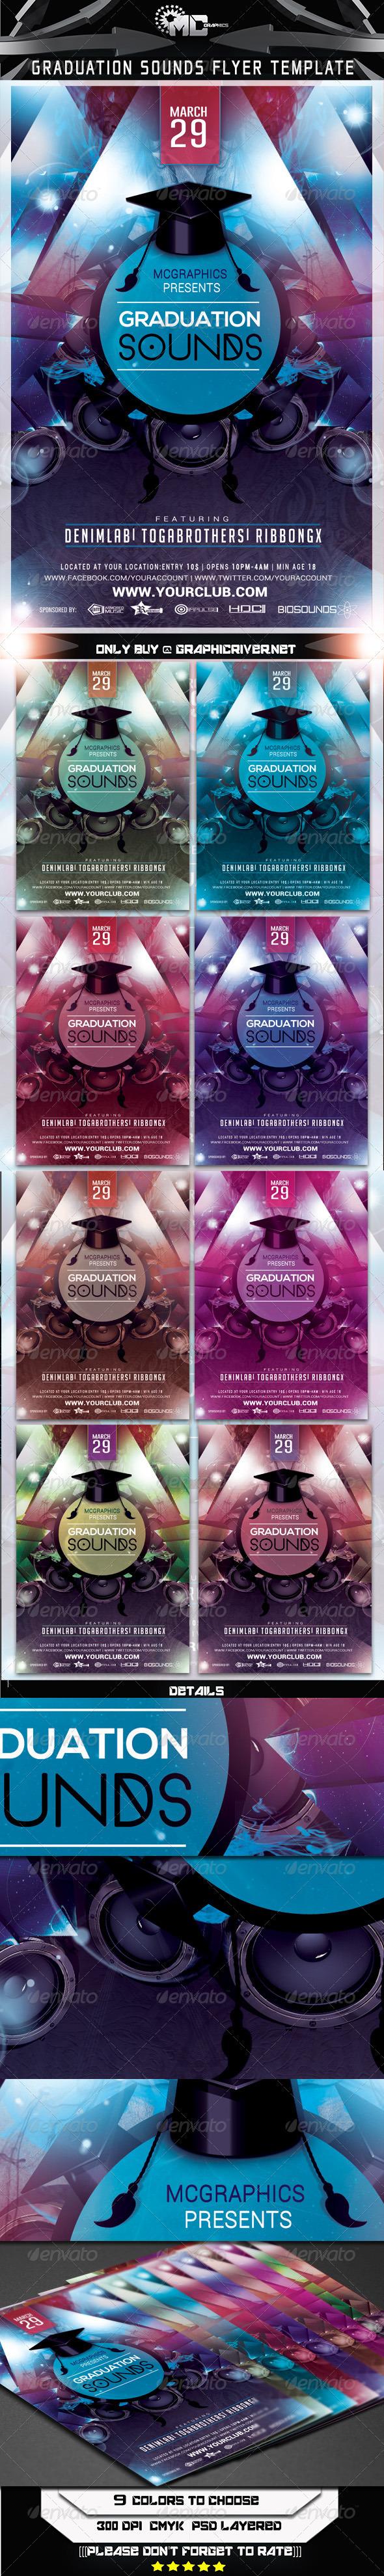 Graduation Sounds Flyer Template - Flyers Print Templates